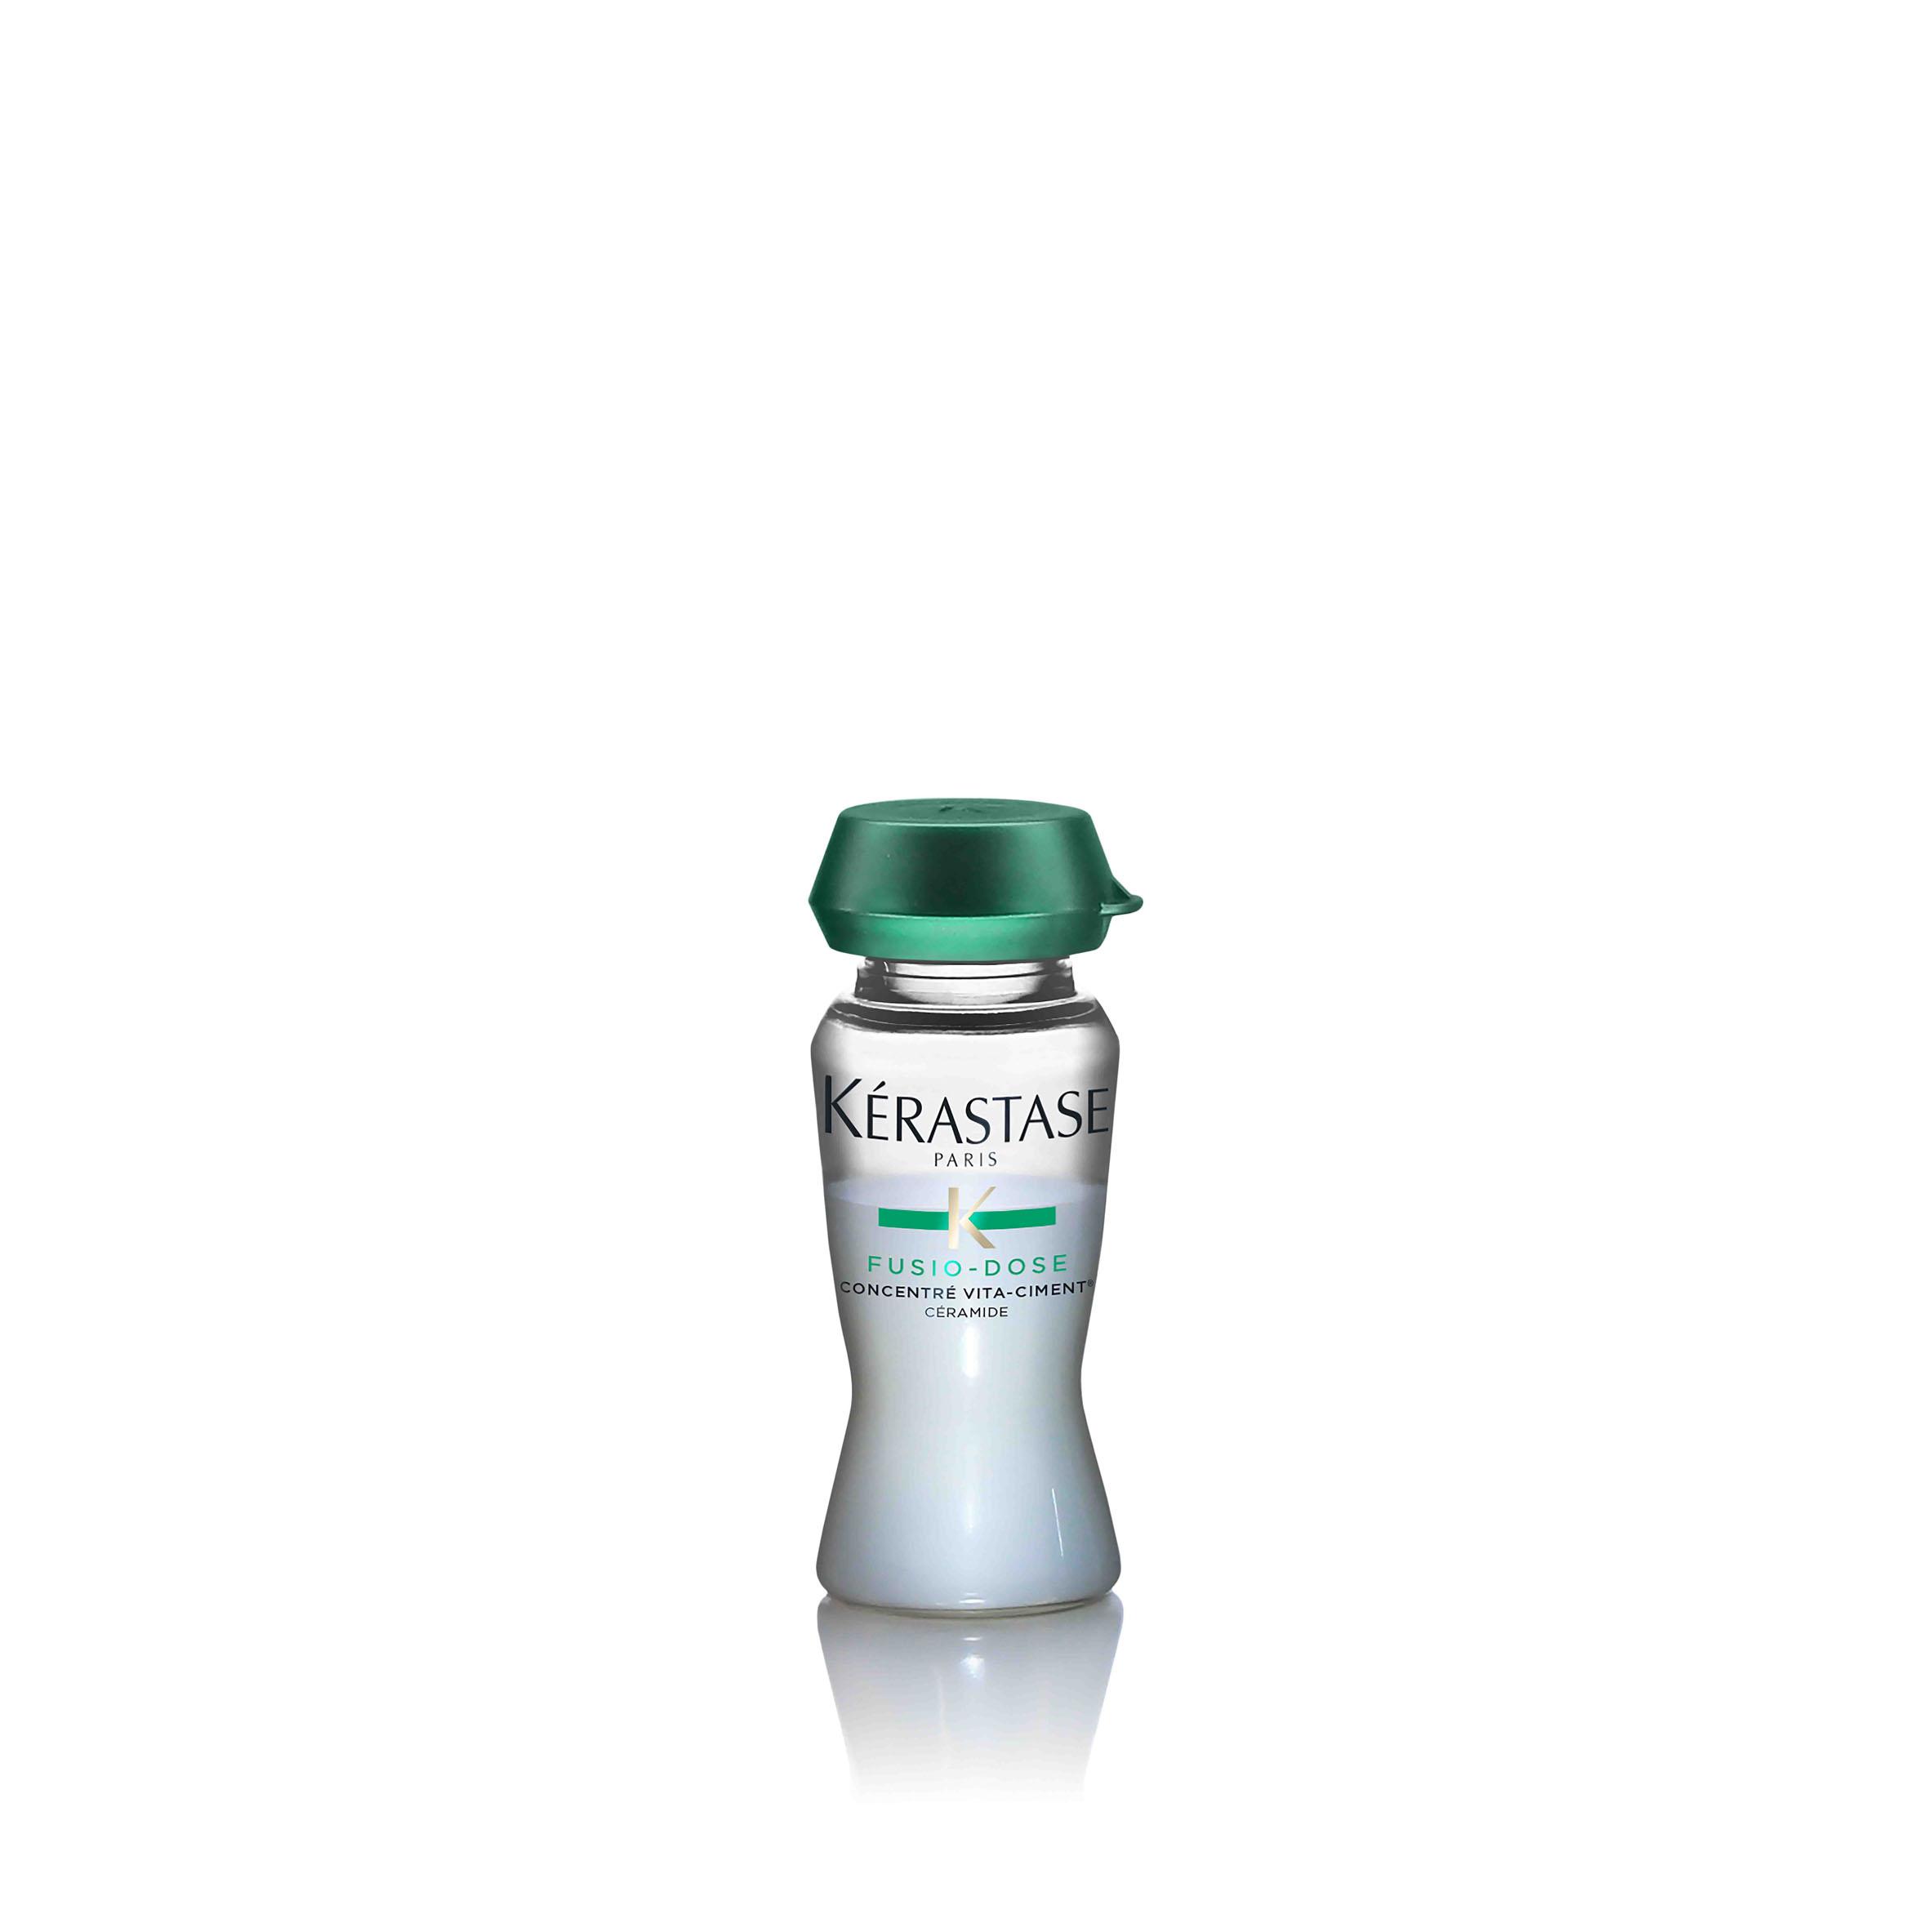 Kérastase Fusio-Dose Concentre VitaCiment